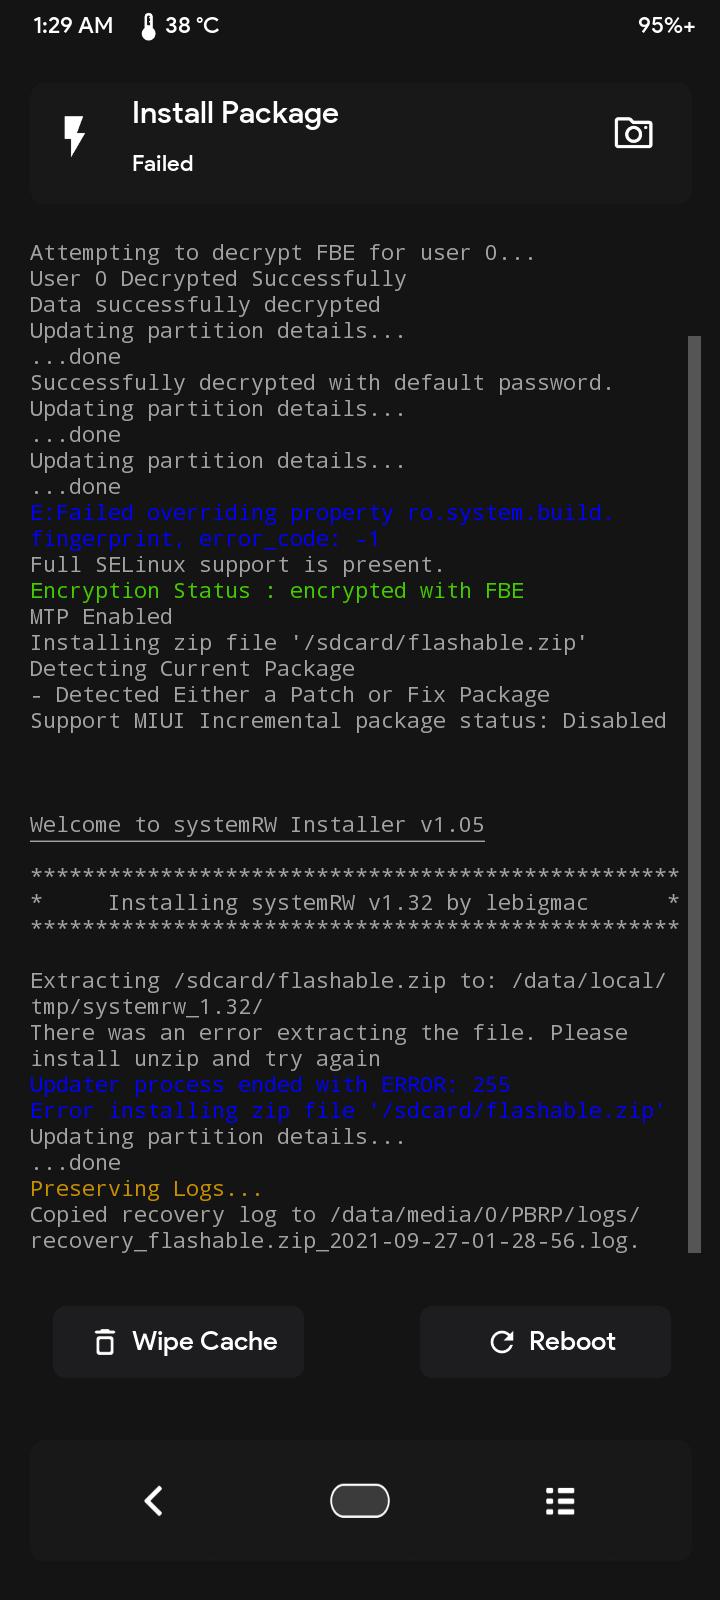 Screenshot_PBRP_2021-09-27-01-29-00.png